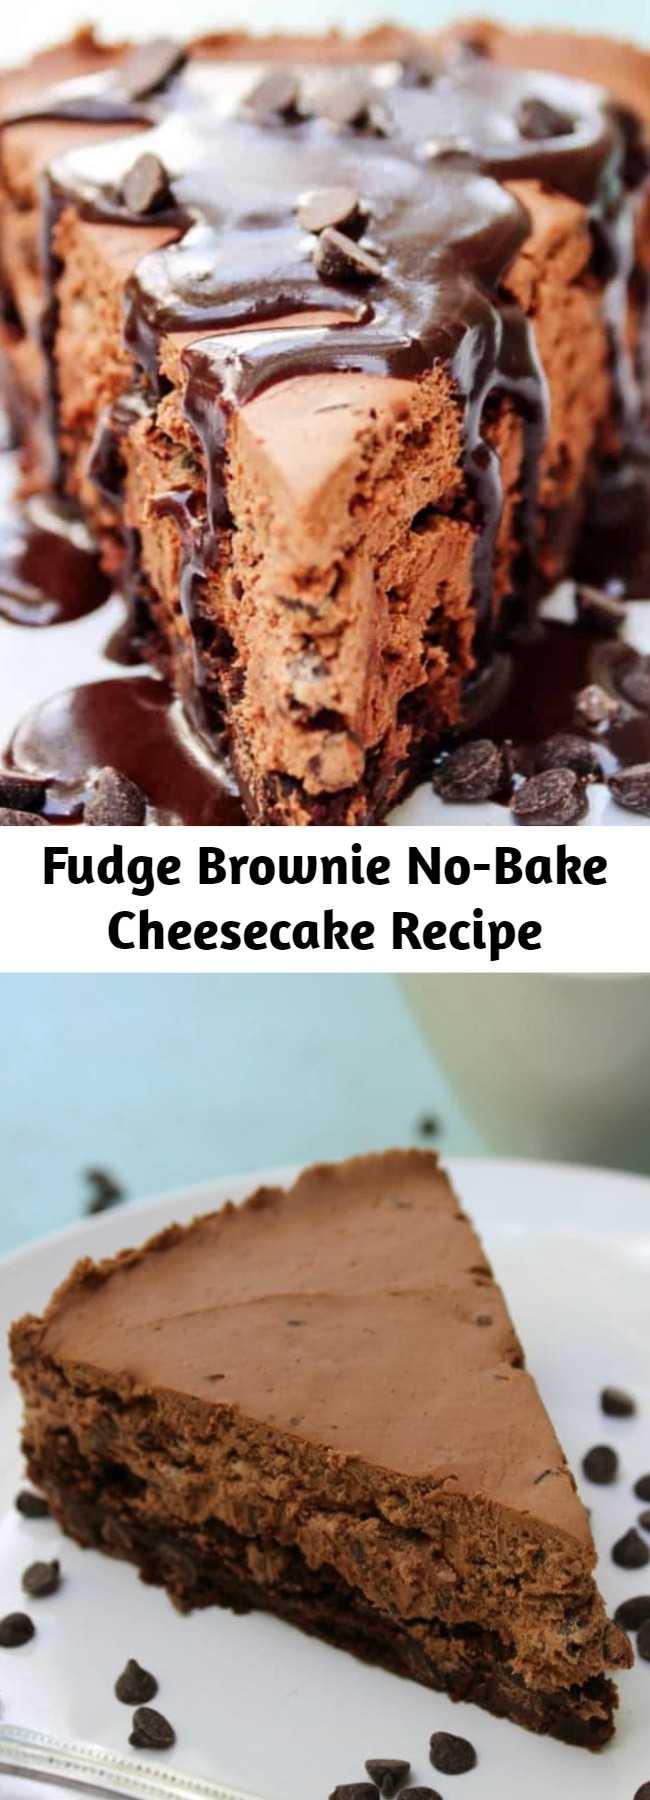 Fudge Brownie No-Bake Cheesecake Recipe - Fudge Brownie No-Bake Cheesecake is a rich, chocolate lover's dream. Made with double chocolate brownie, chocolate chip no-bake cheesecake, and fudge.